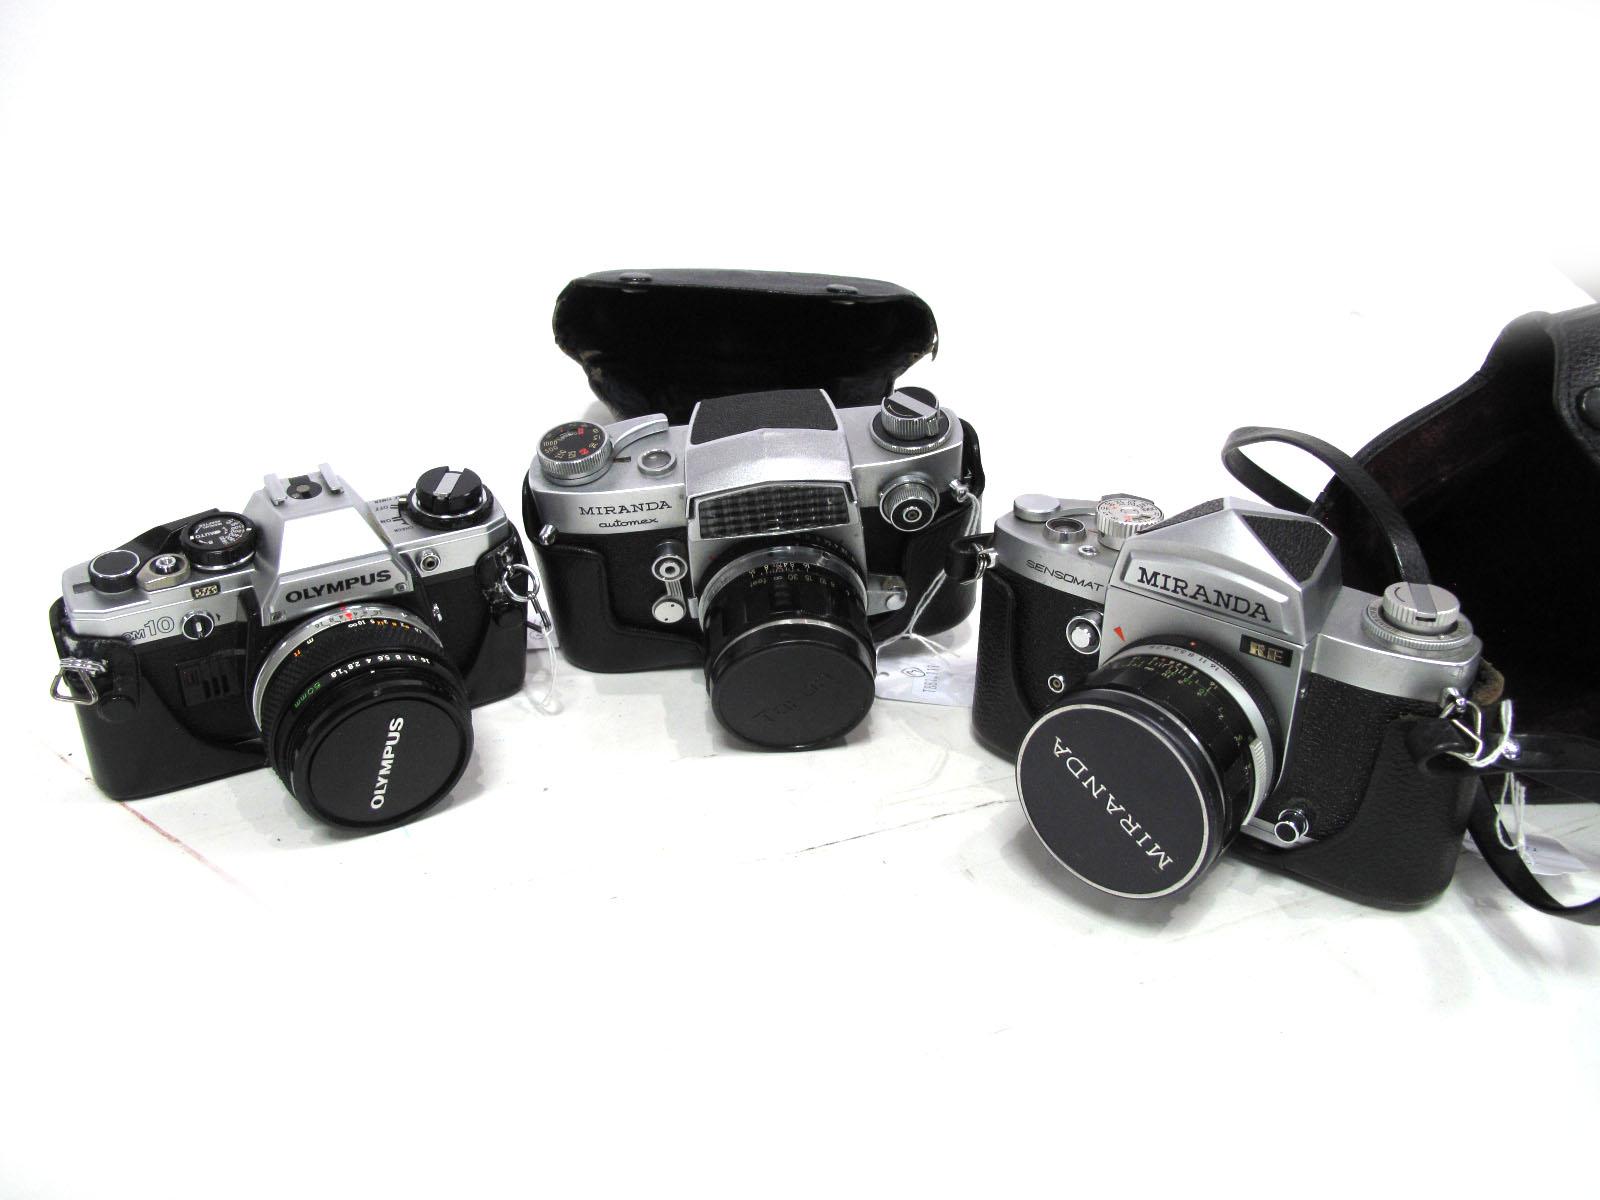 Olympus OM 10 Camera, with Zuiko Auto-S 50mm lens, Miranda Automex Camera with Miranda lens, Miranda